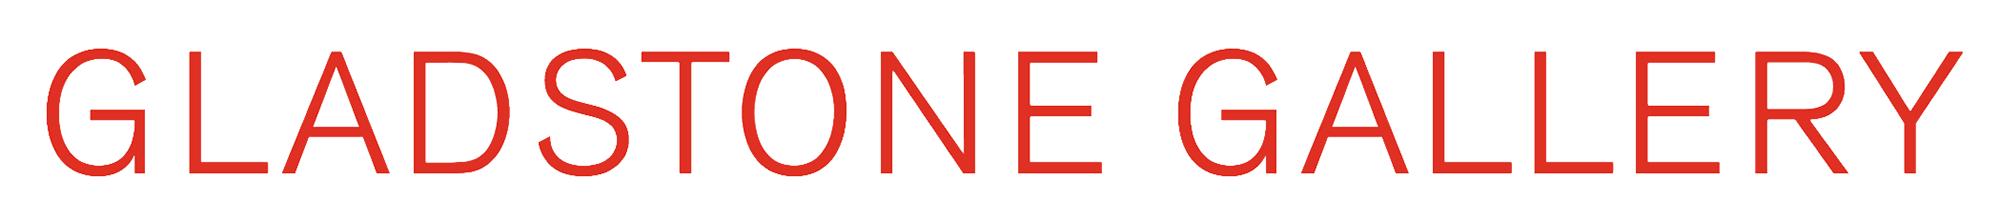 Gladstone Gallery company logo